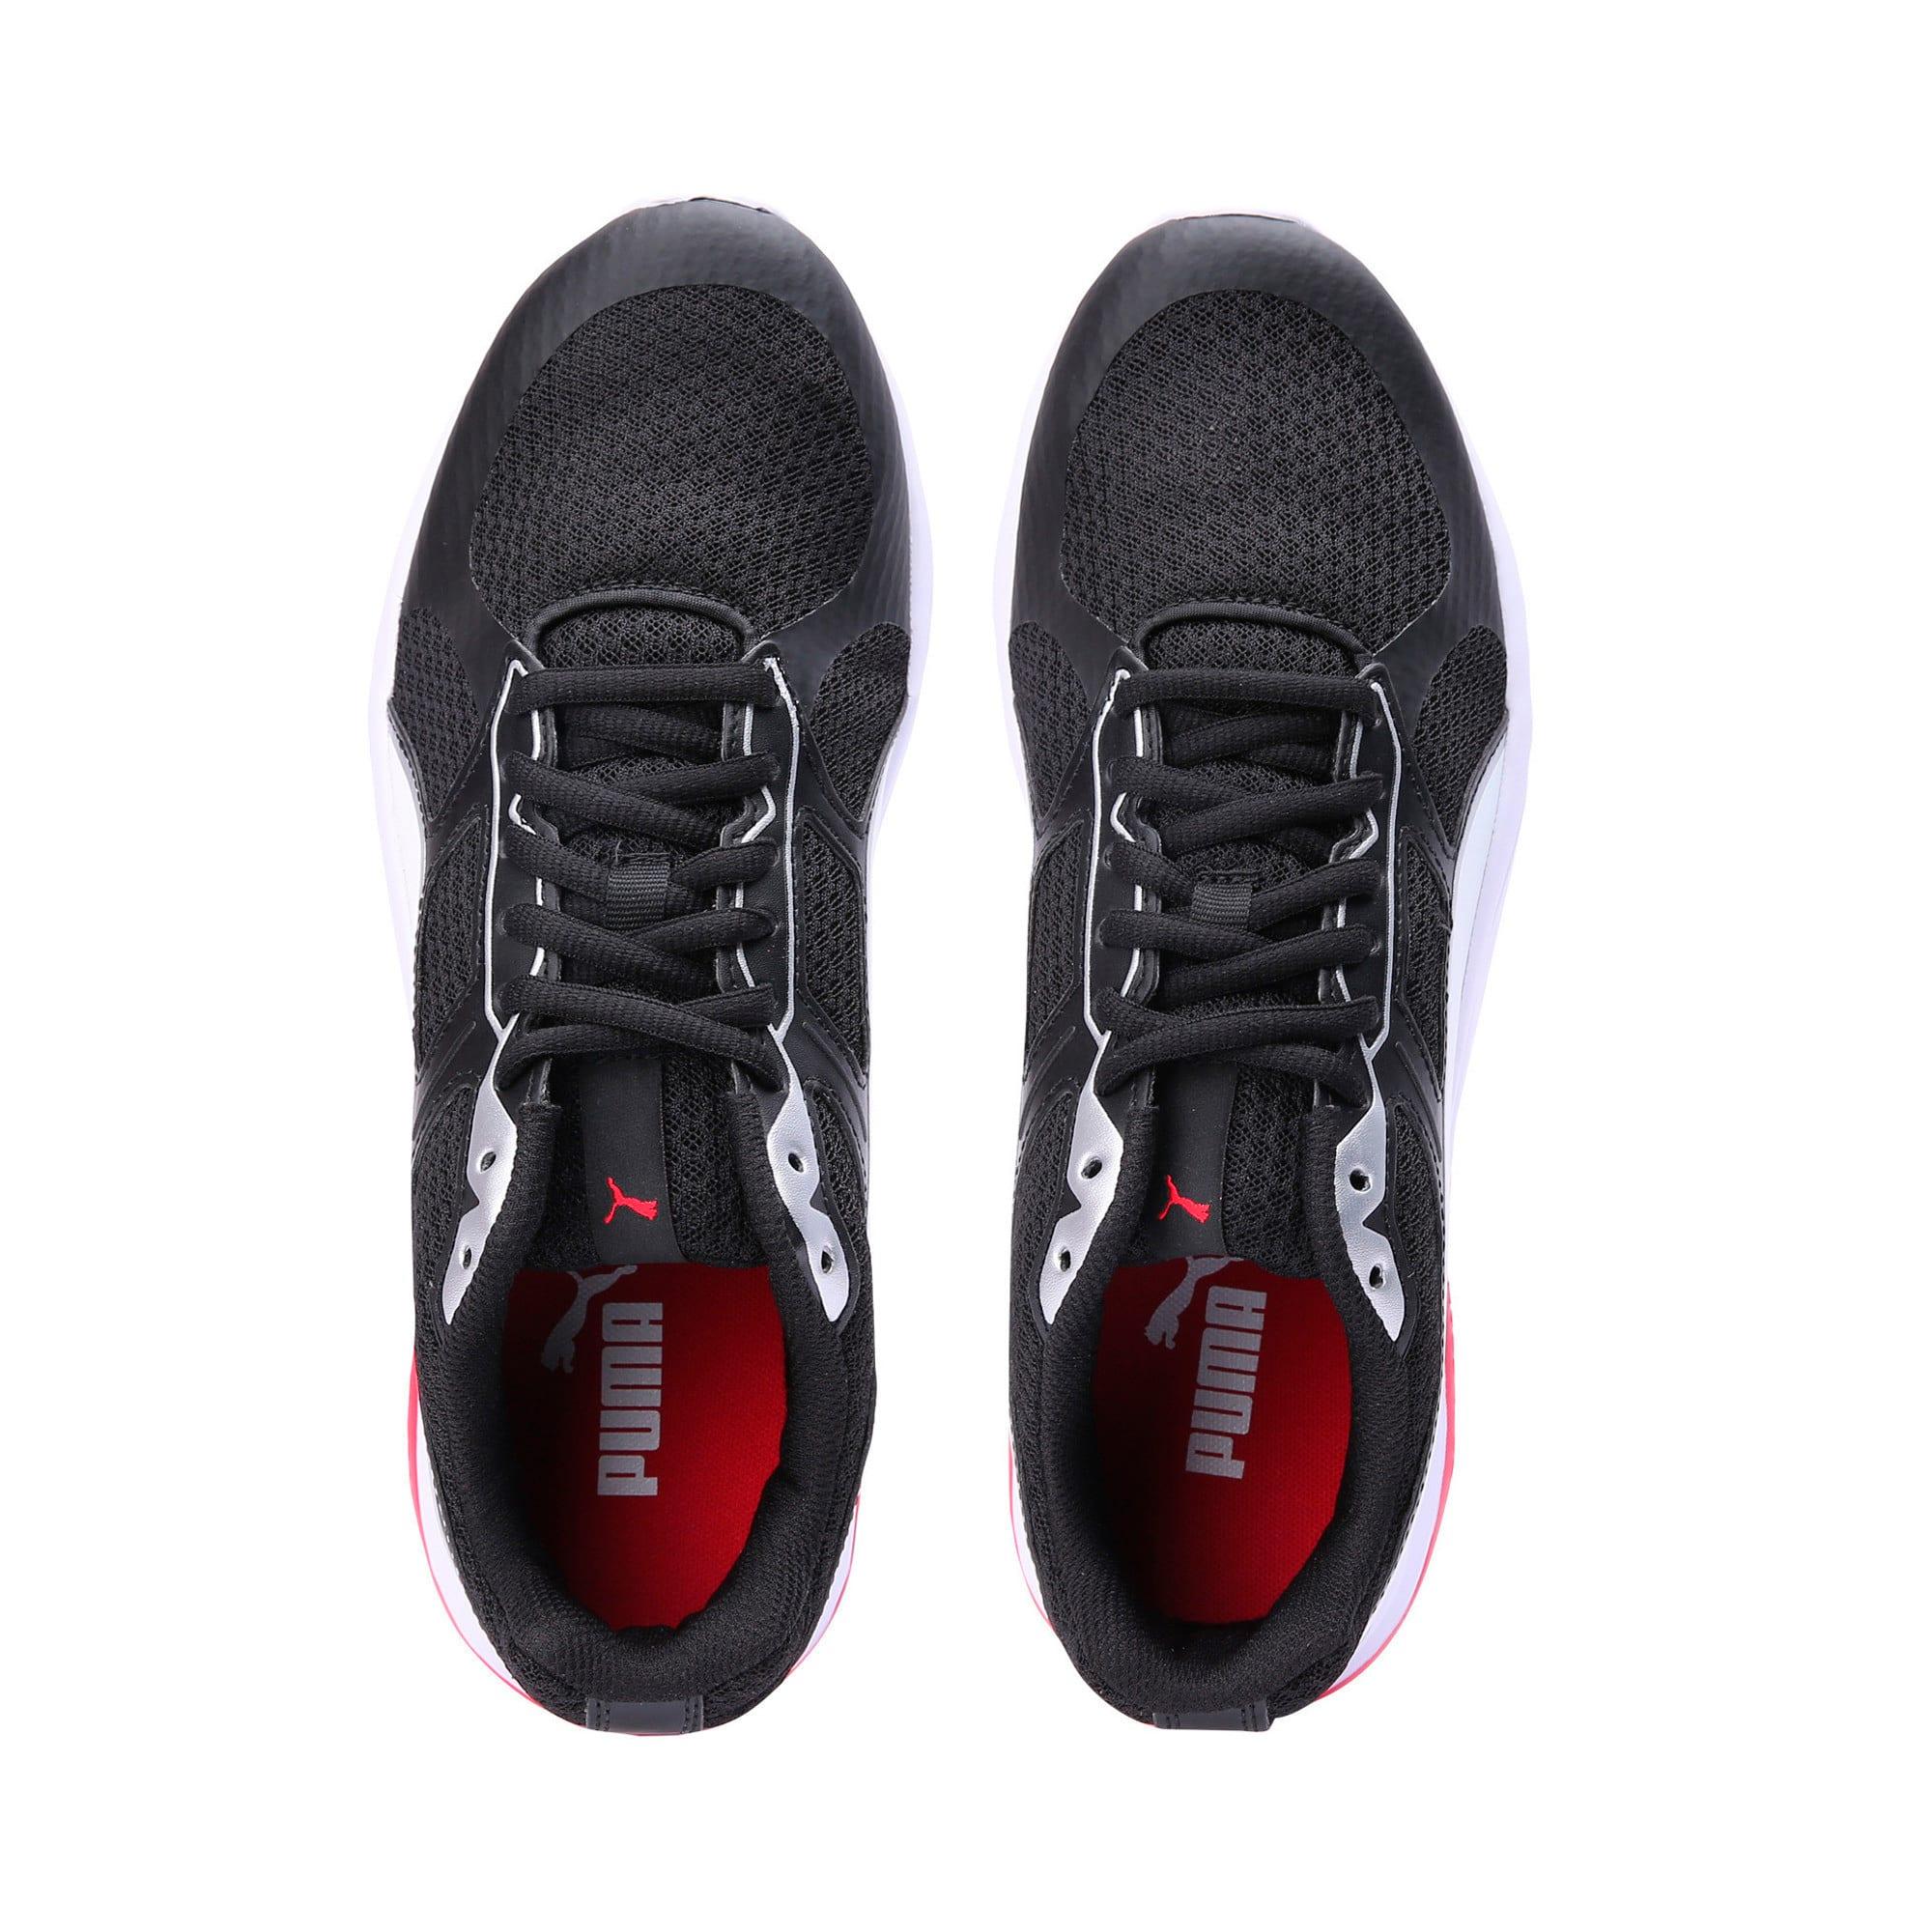 Thumbnail 6 of Escaper Tech Sneakers, P. Black-P. White-Fl.Scarlet, medium-IND